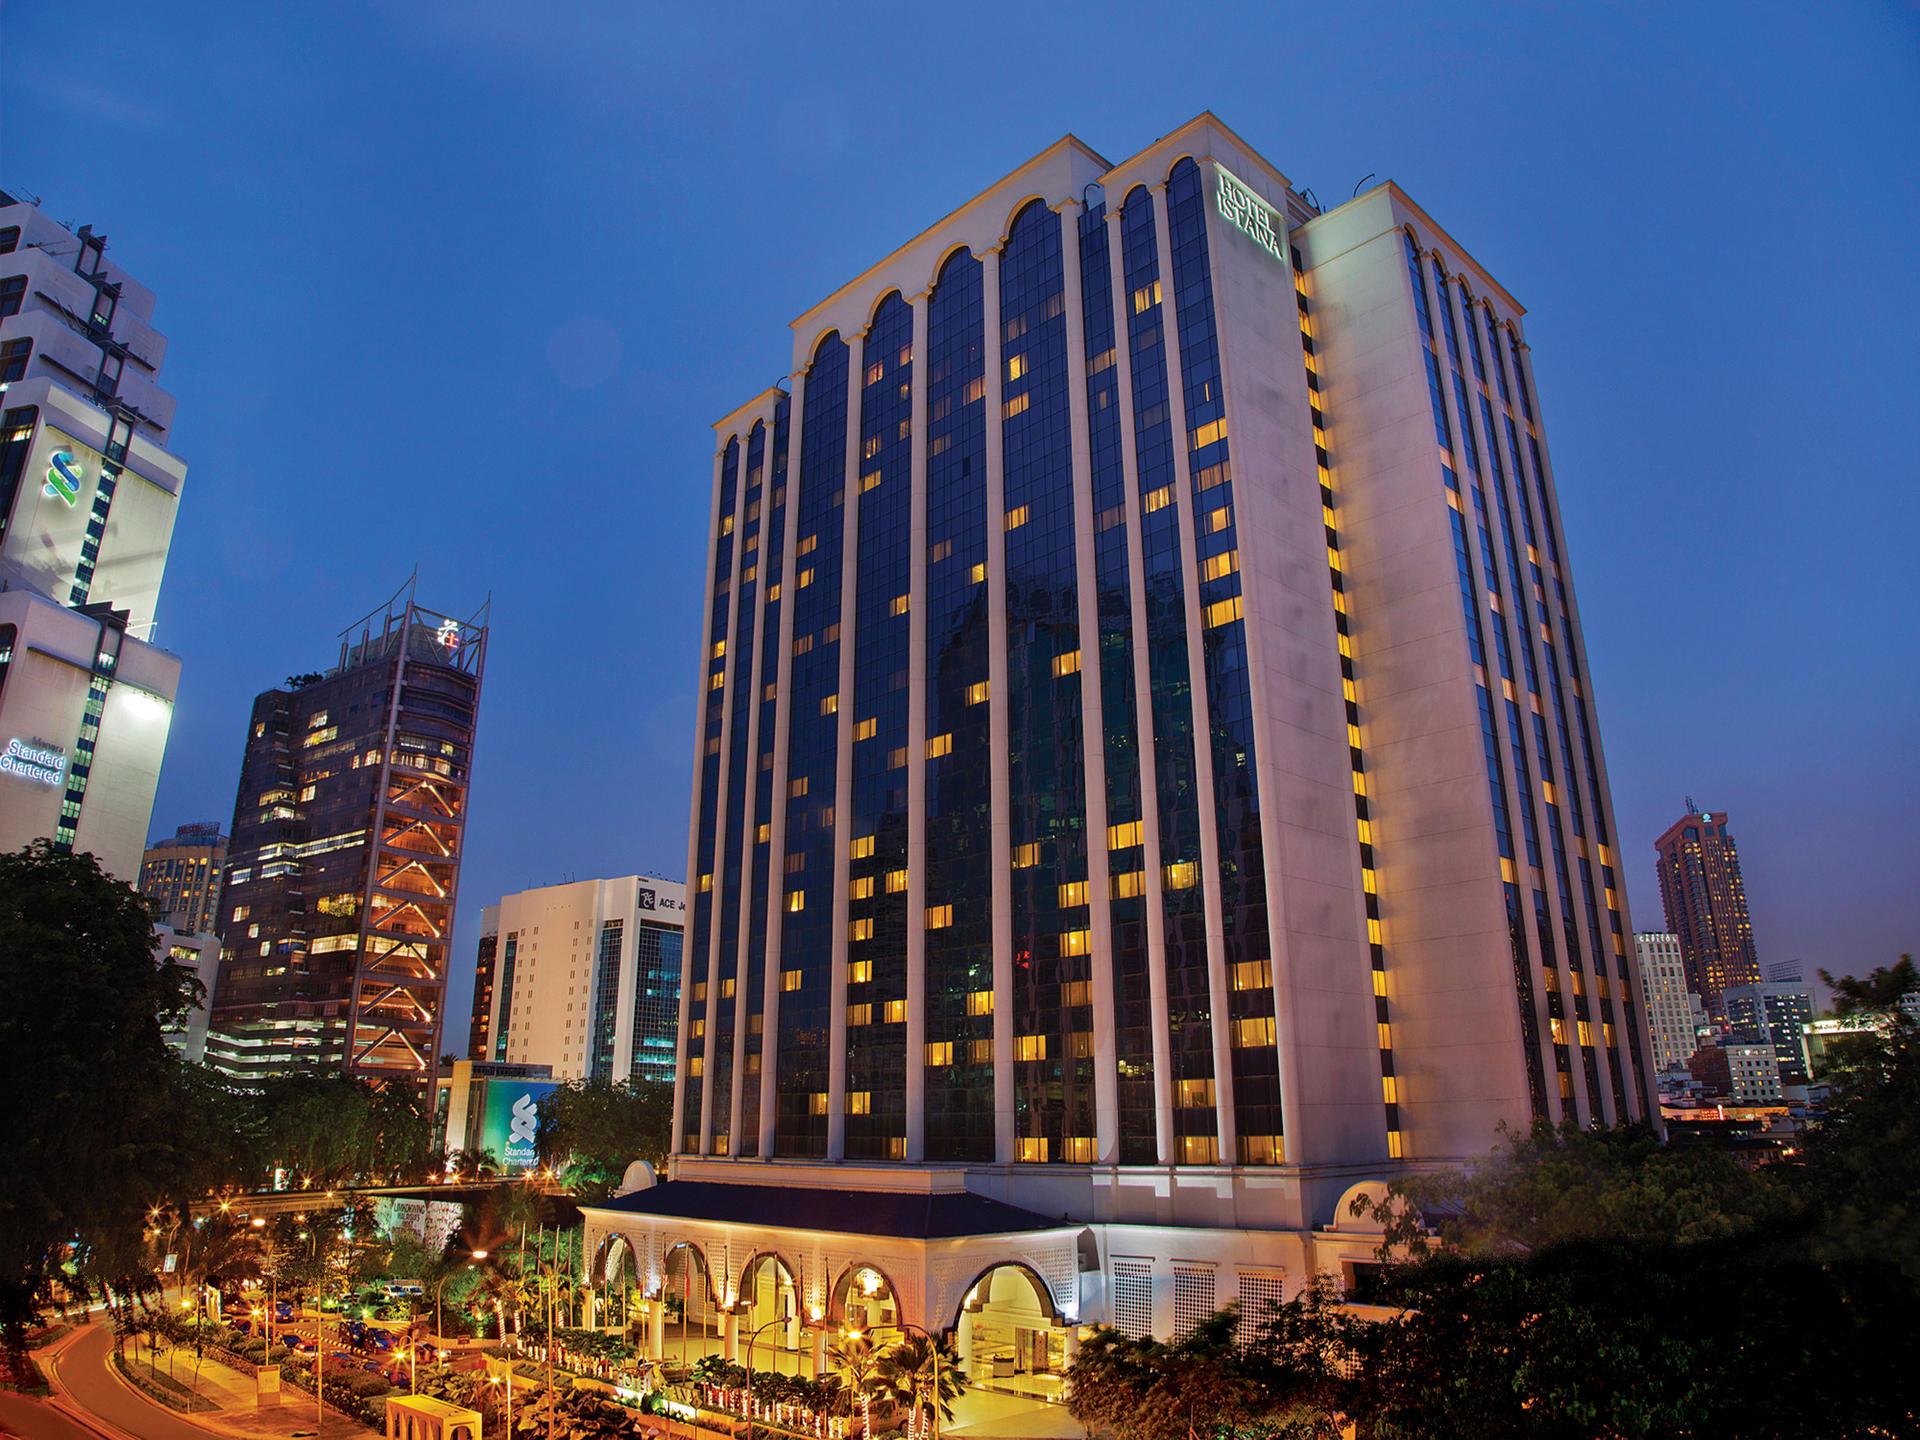 Facade of Hotel Istana Kuala Lumpur at night